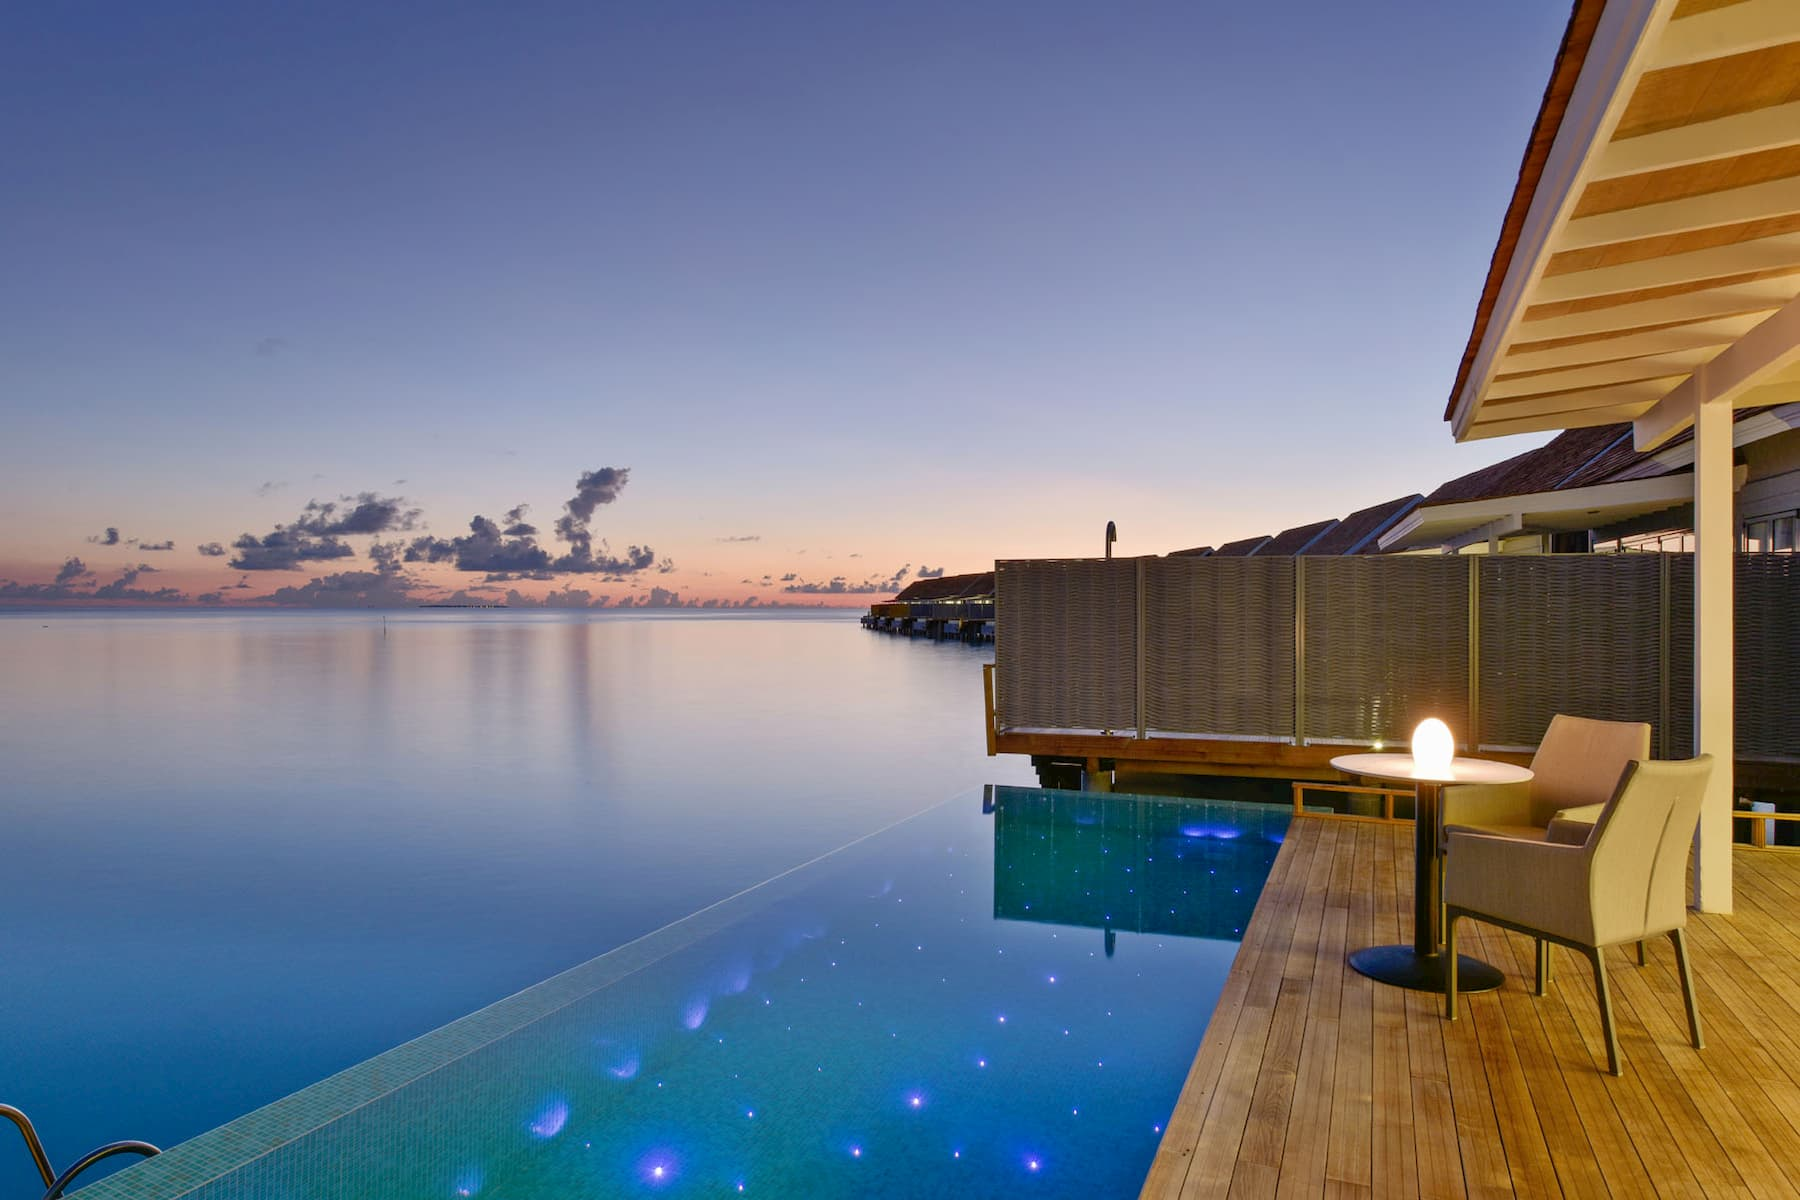 Resort Maldive Kuramathi Island resort water villa with pool